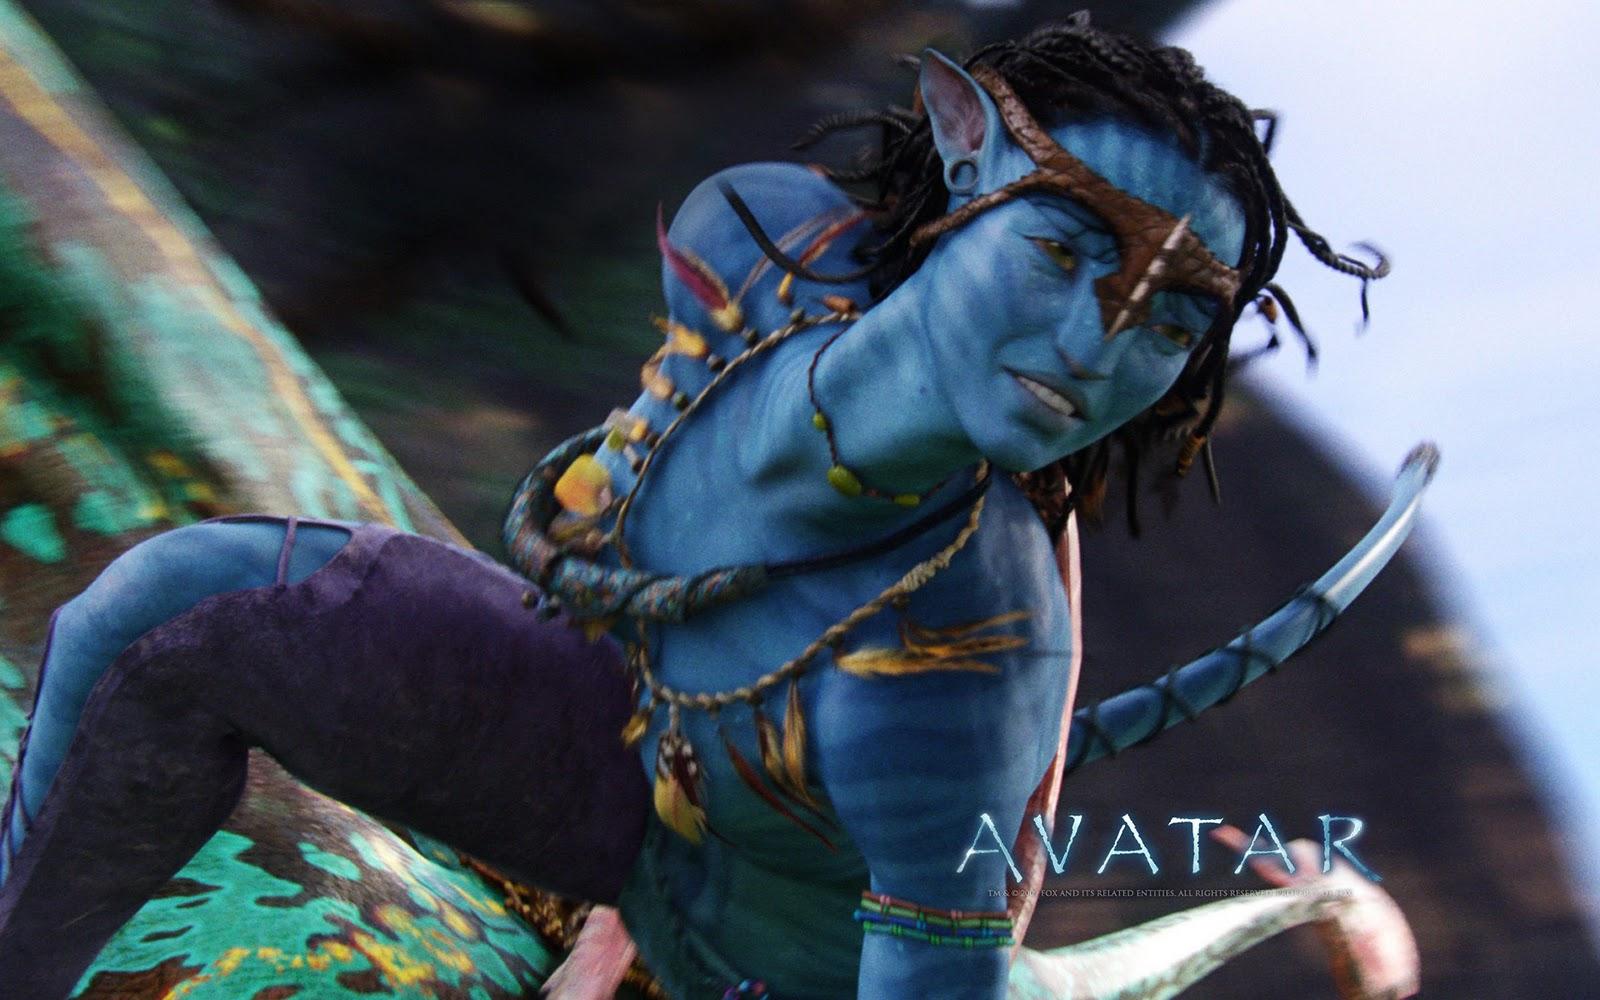 http://3.bp.blogspot.com/__r2lJDytrSI/TSZPL9ix4-I/AAAAAAAAAgM/XYbzC-bwJ38/s1600/Avatar%252C_2009%252C_Zoe_Saldana_as_Neytiri.jpg